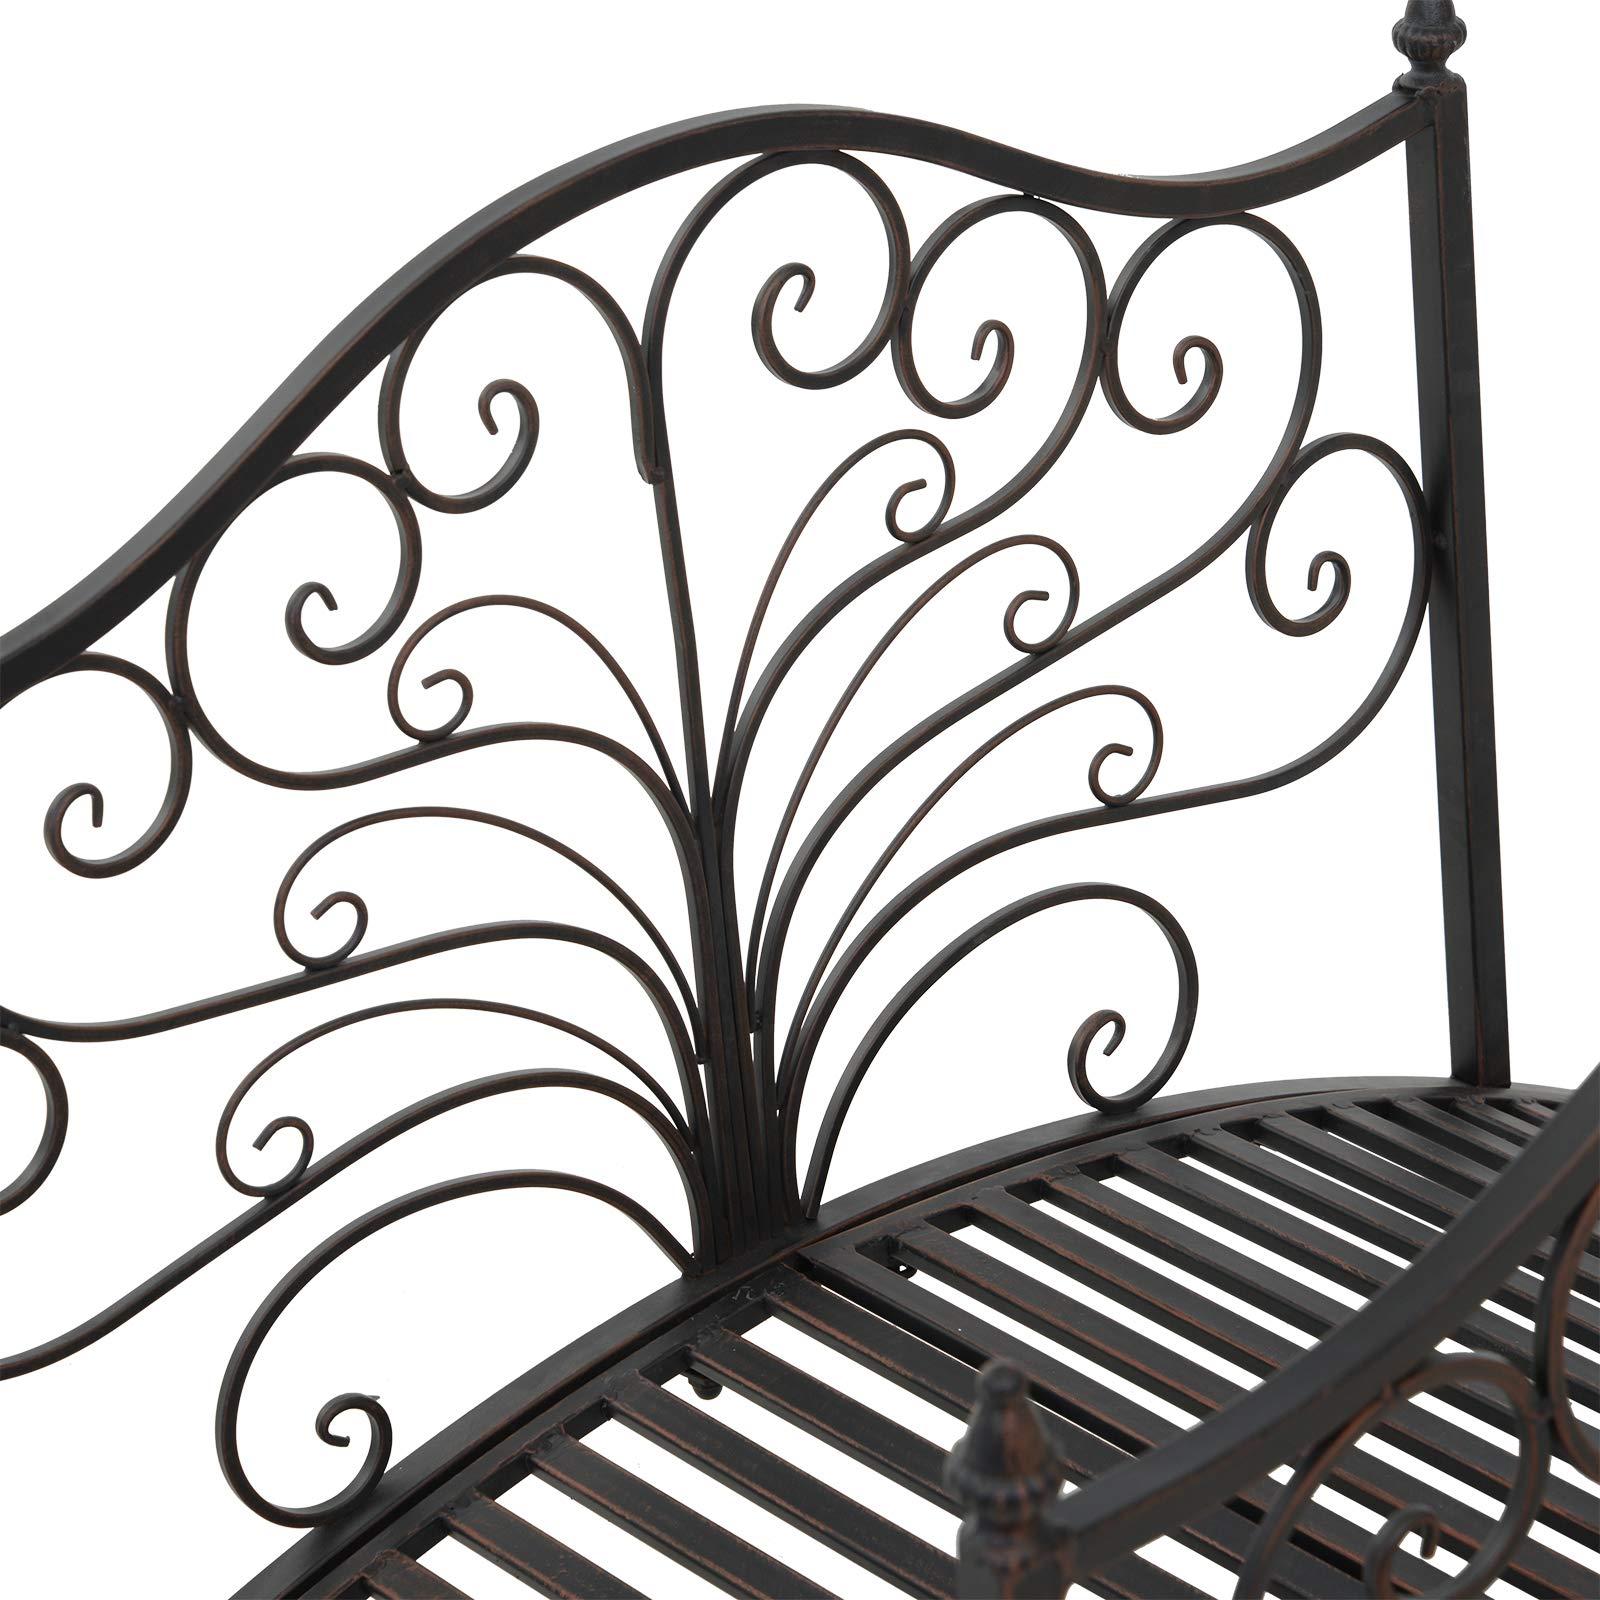 Festnight Outdoor Metal Garden Bridge Patio Backyard Decorative Bridge Black Bronze, 4' by Festnight (Image #5)